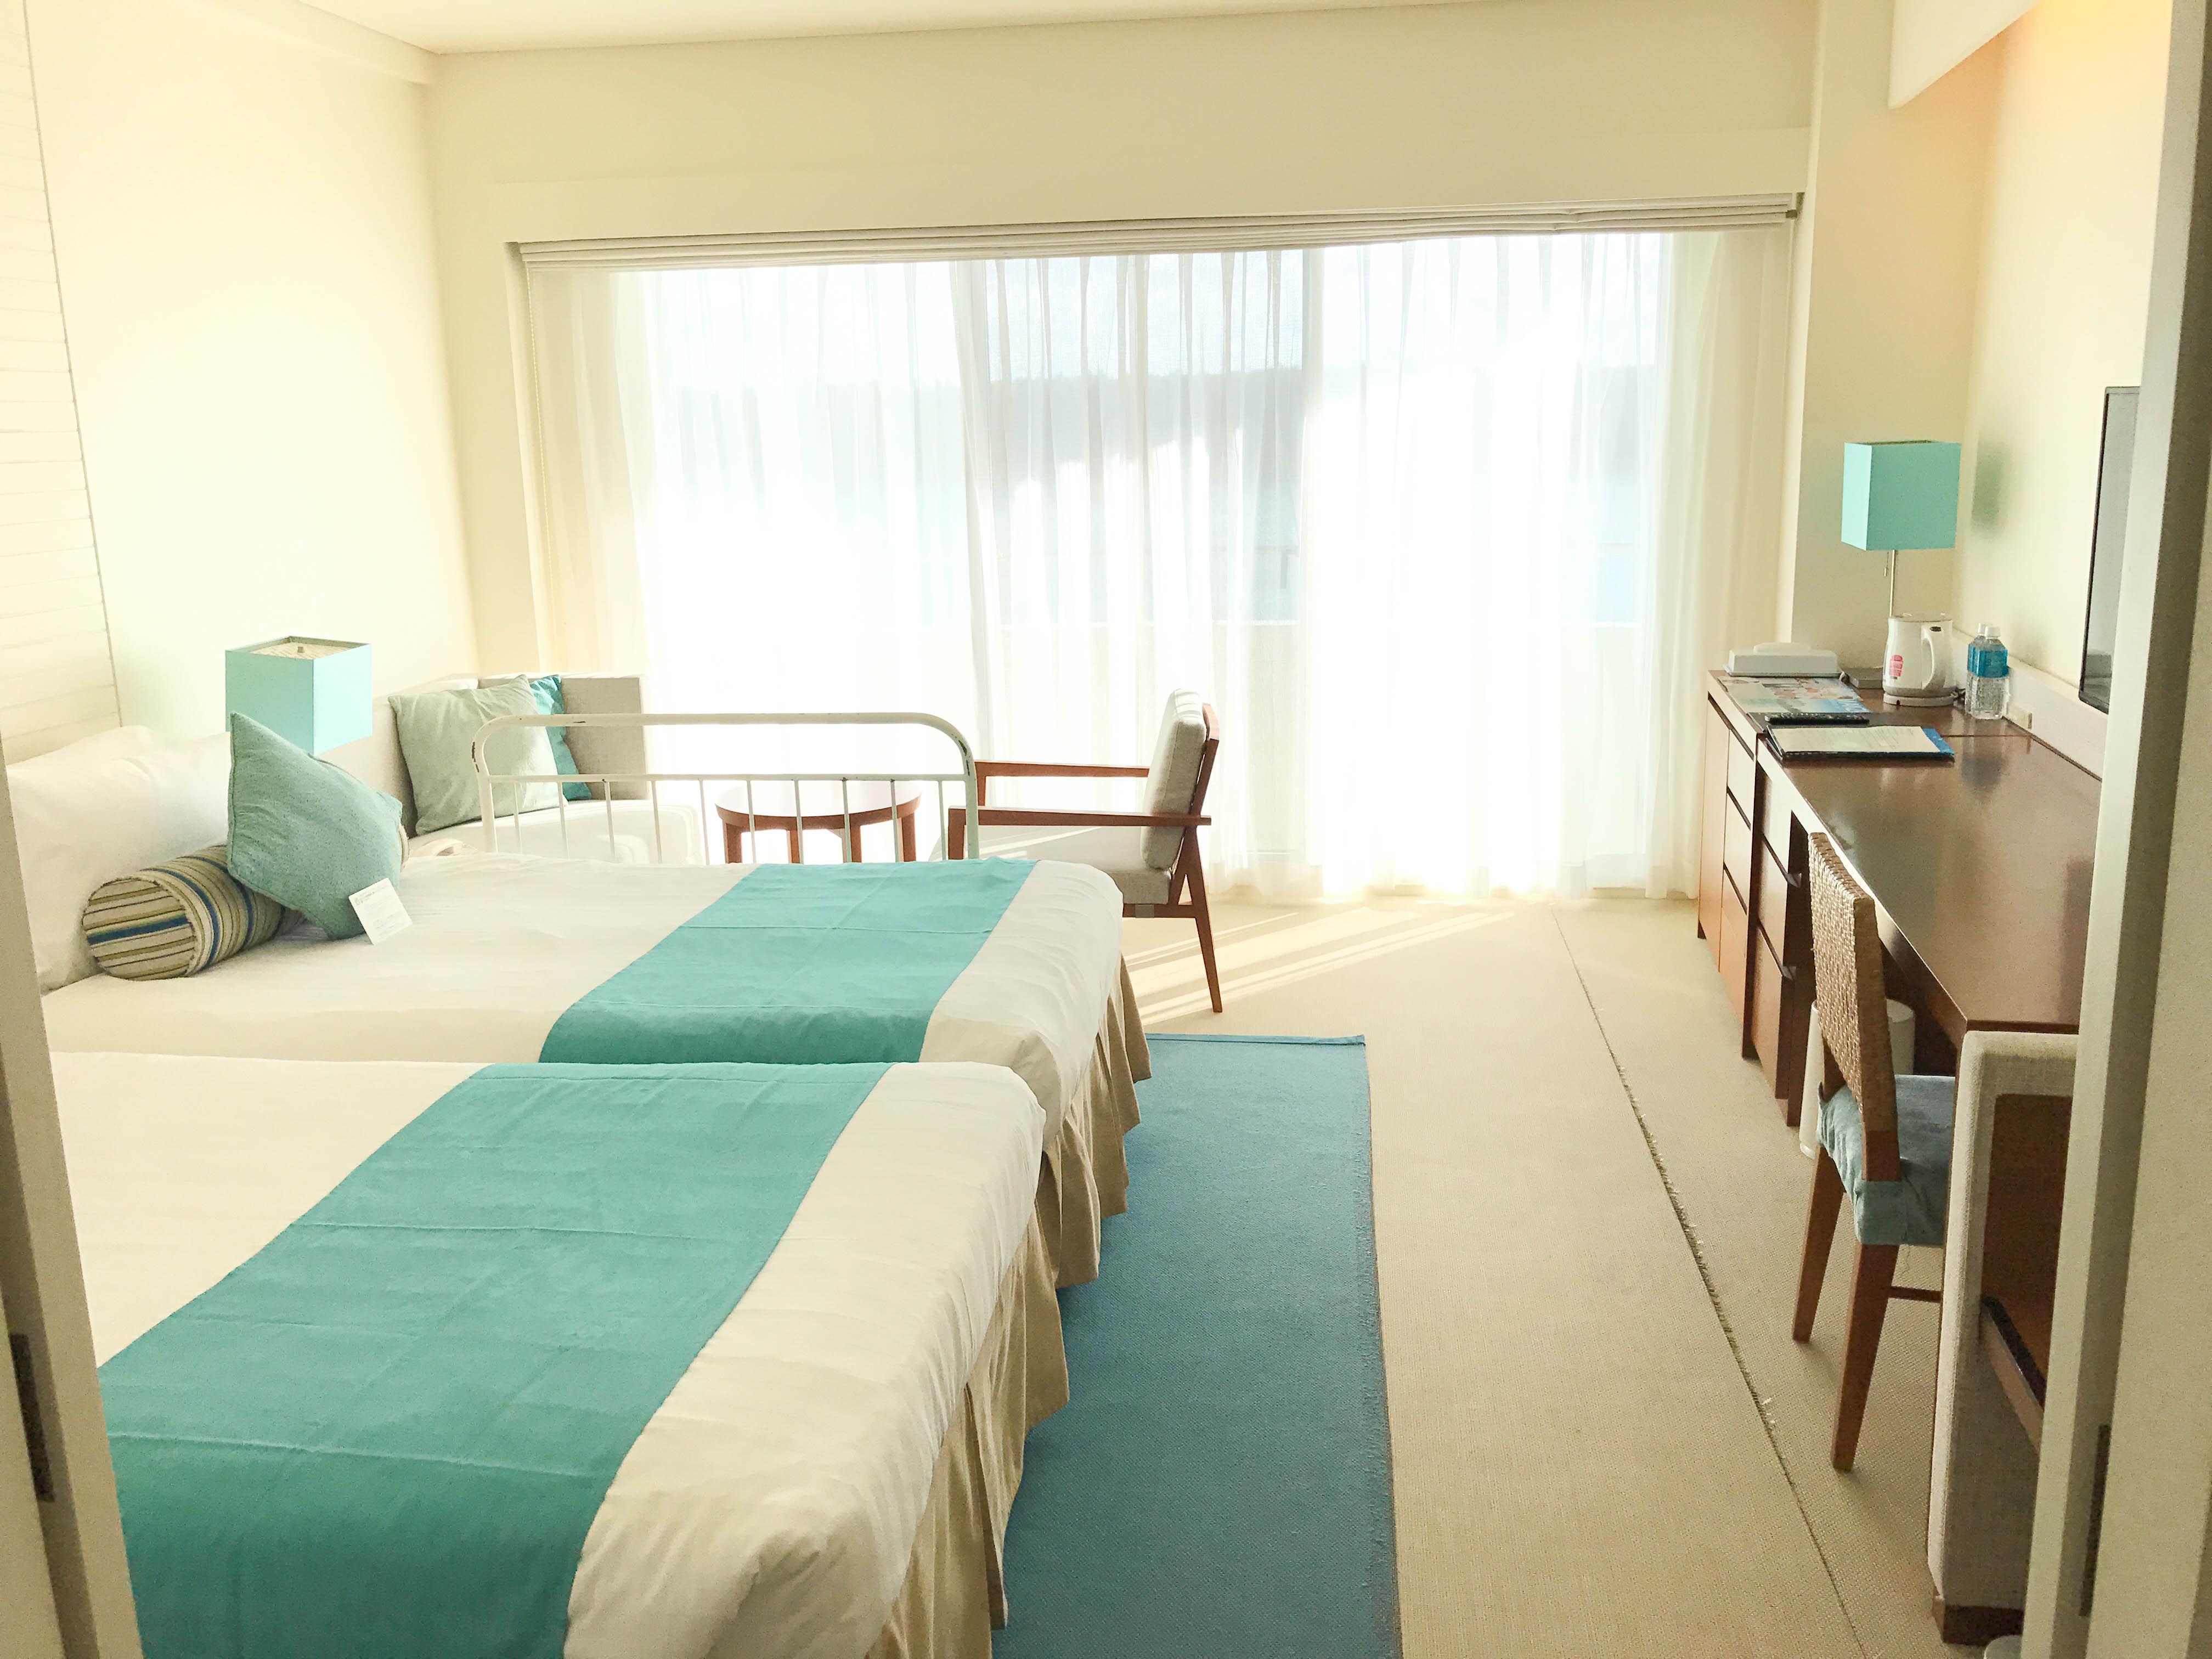 ANAインターコンチネンタル万座ビーチリゾートの客室